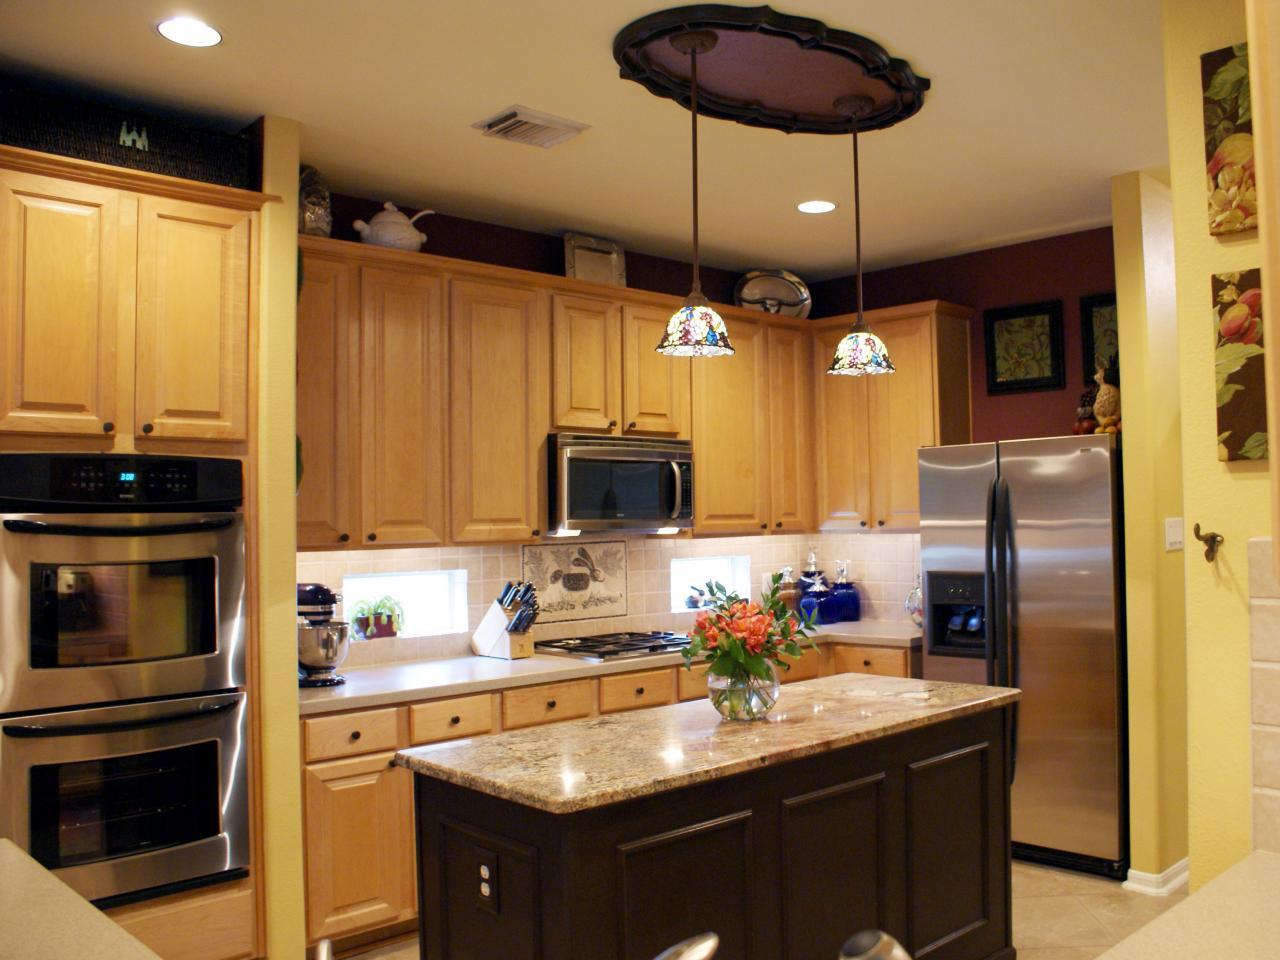 kitchen cabinets ideas diy photo - 9